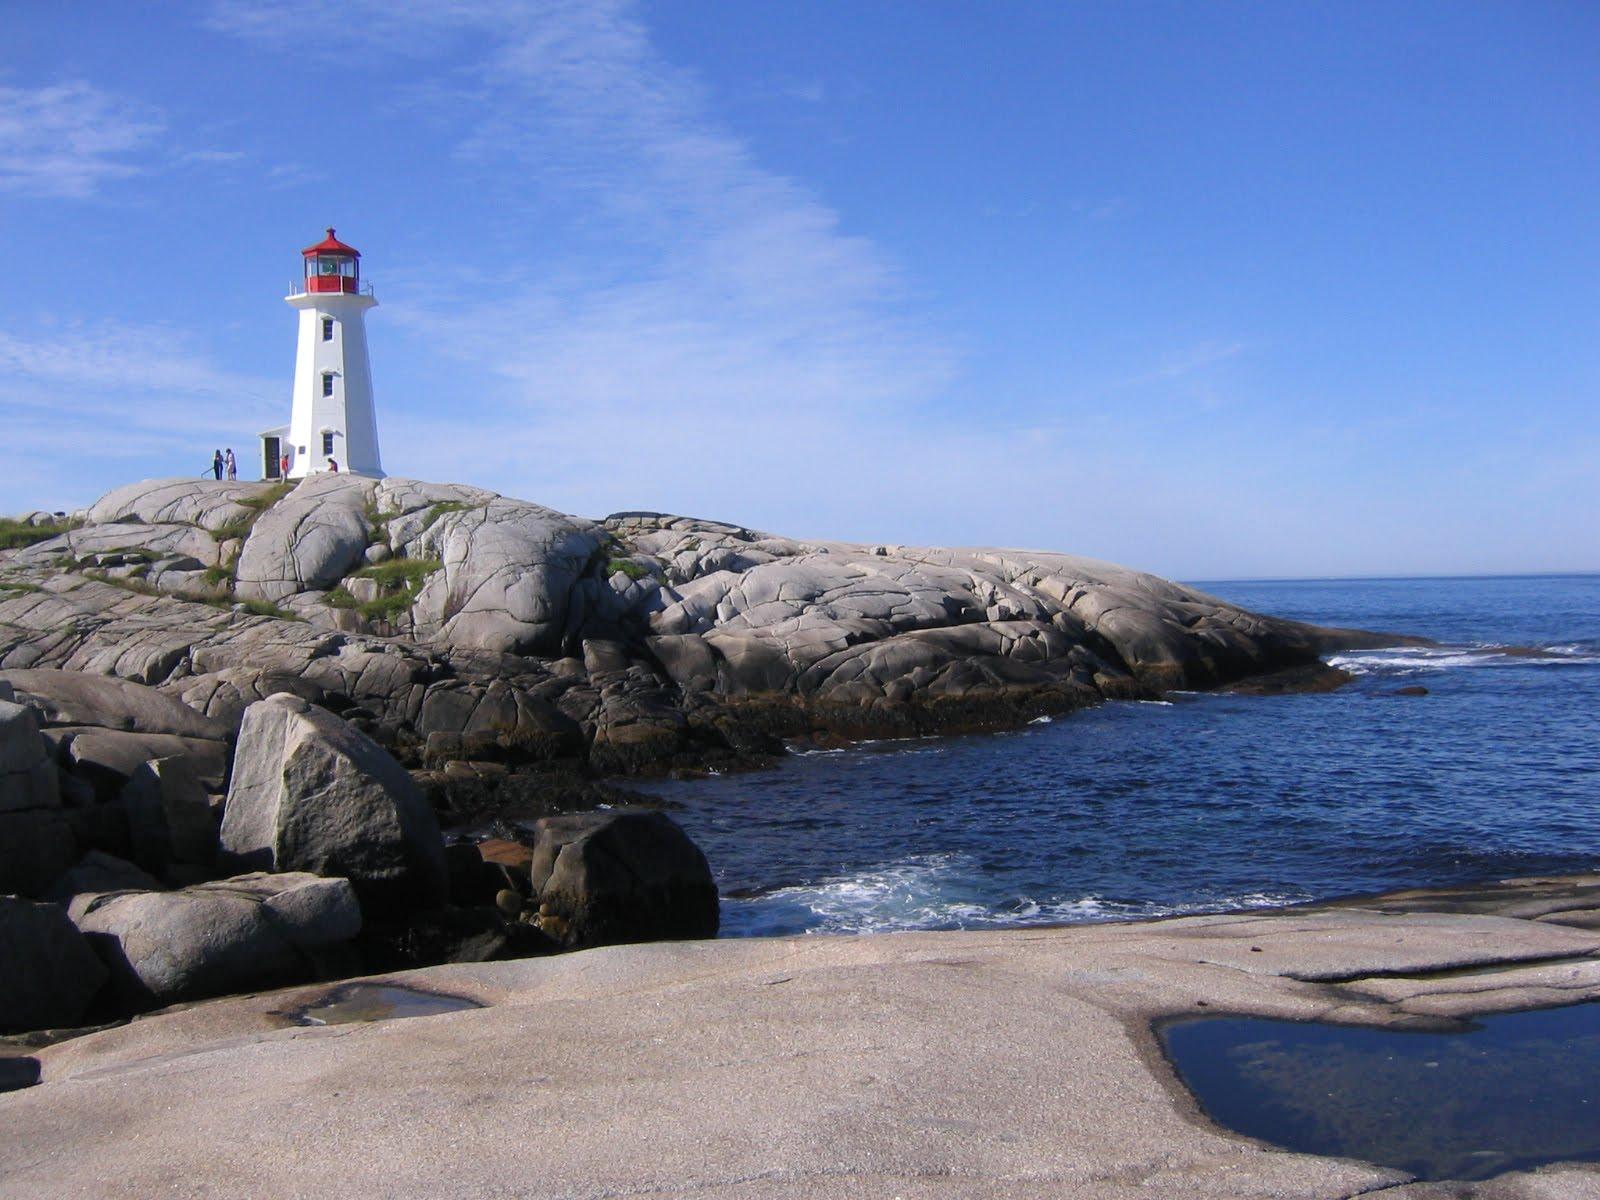 3.bp.blogspot.com__K0h43ZrPrCw_TBPXoM29WqI_AAAAAAAAAbg_lq79xn0dy1M_s1600_Peggys_Cove_Nova_Scotia_01